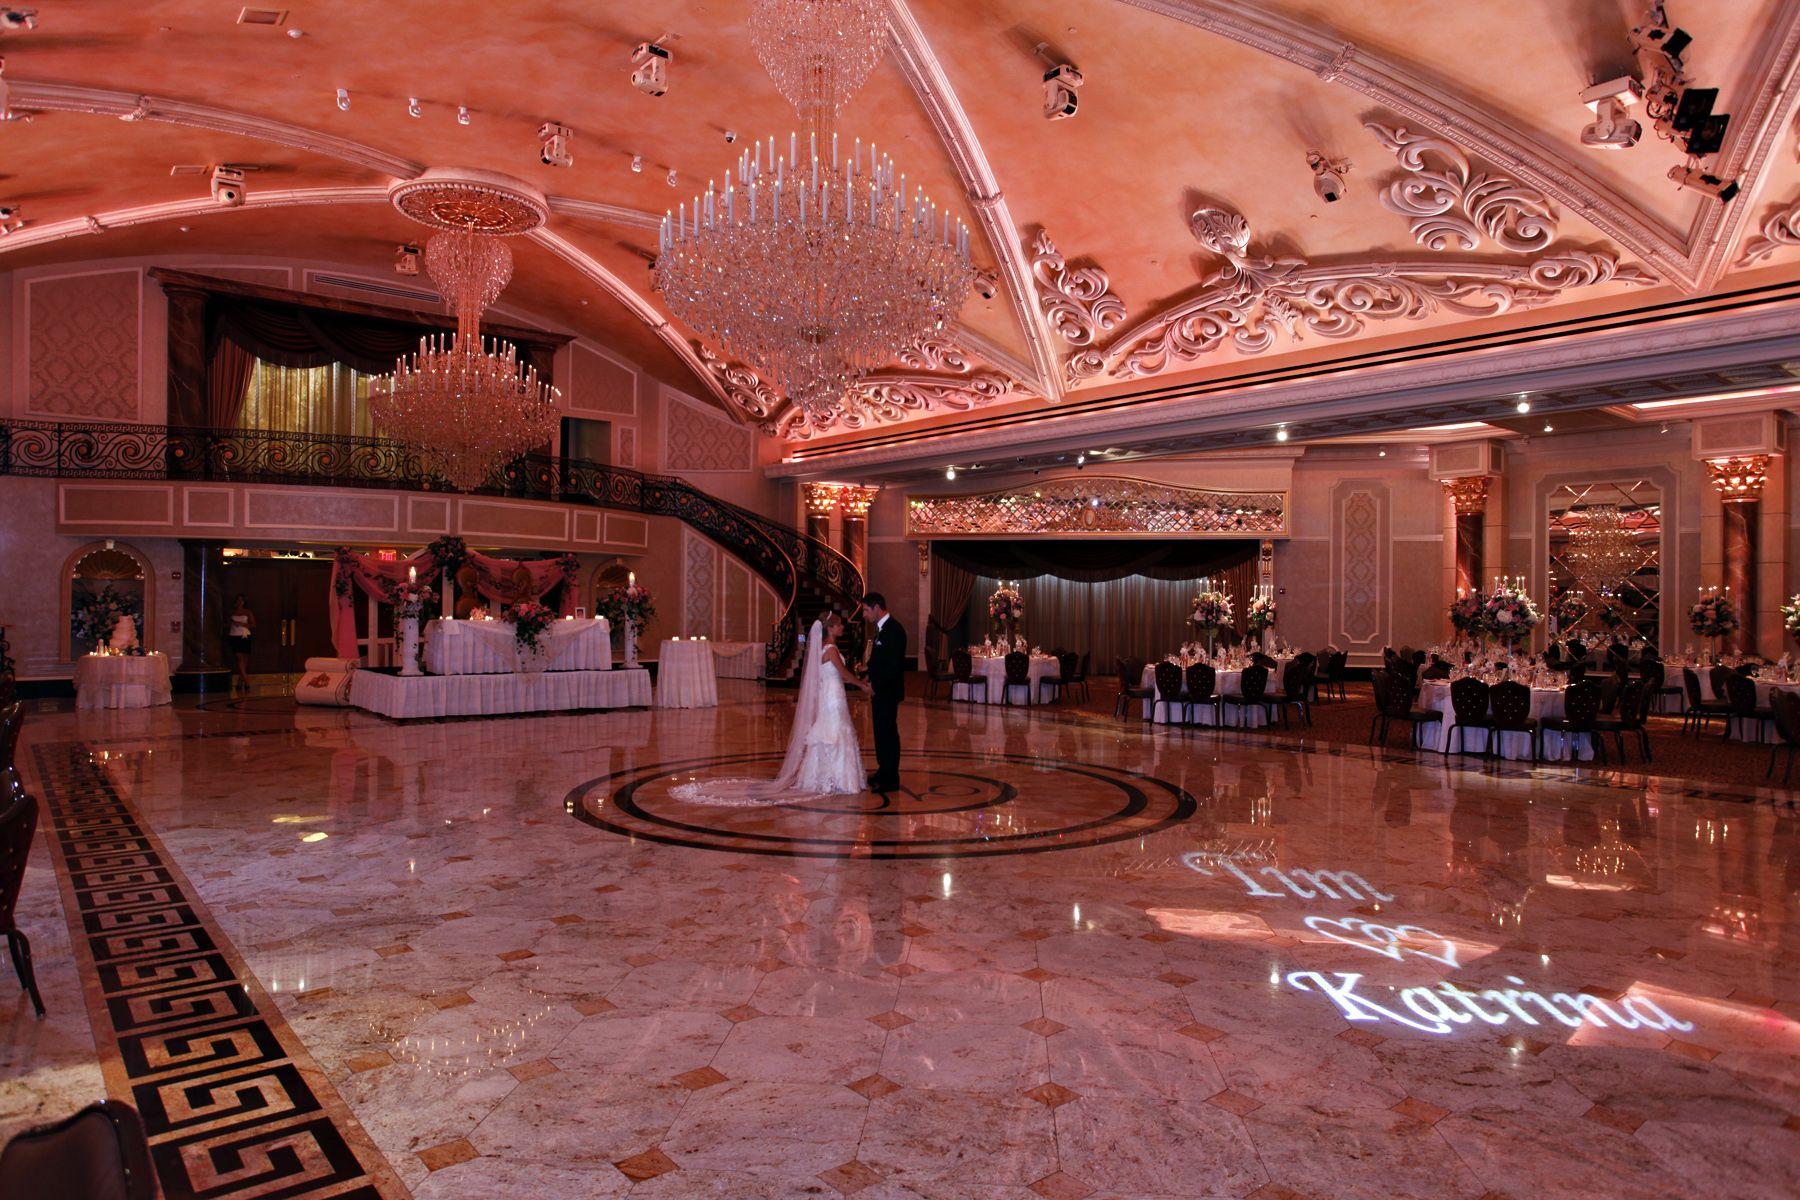 Venue For My Wedding The Venetian Nj Amazing Dream